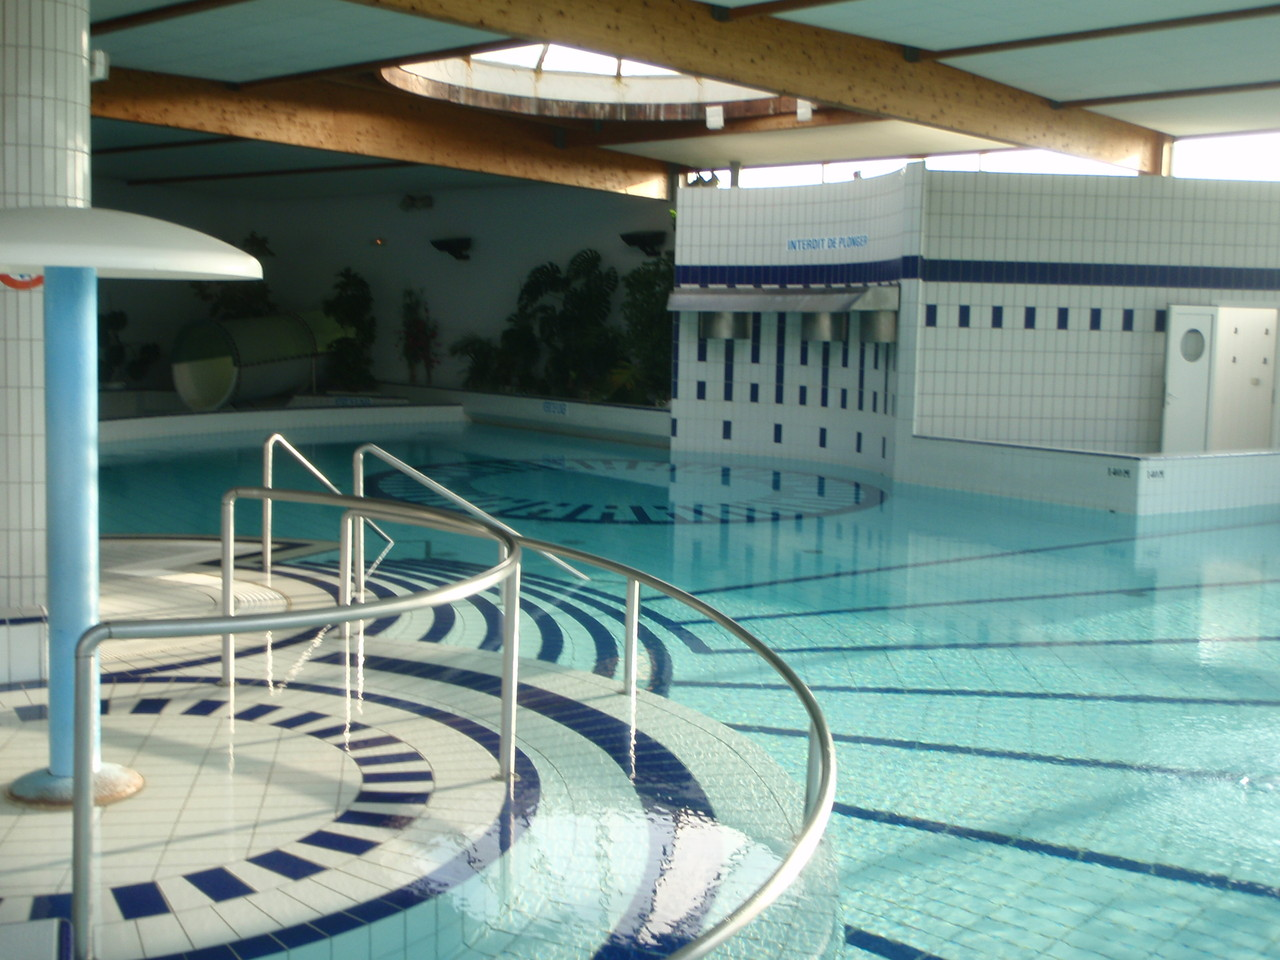 Piscine beatrice heiss riom site des b b s nageoires riom for Cash piscine lempdes 63